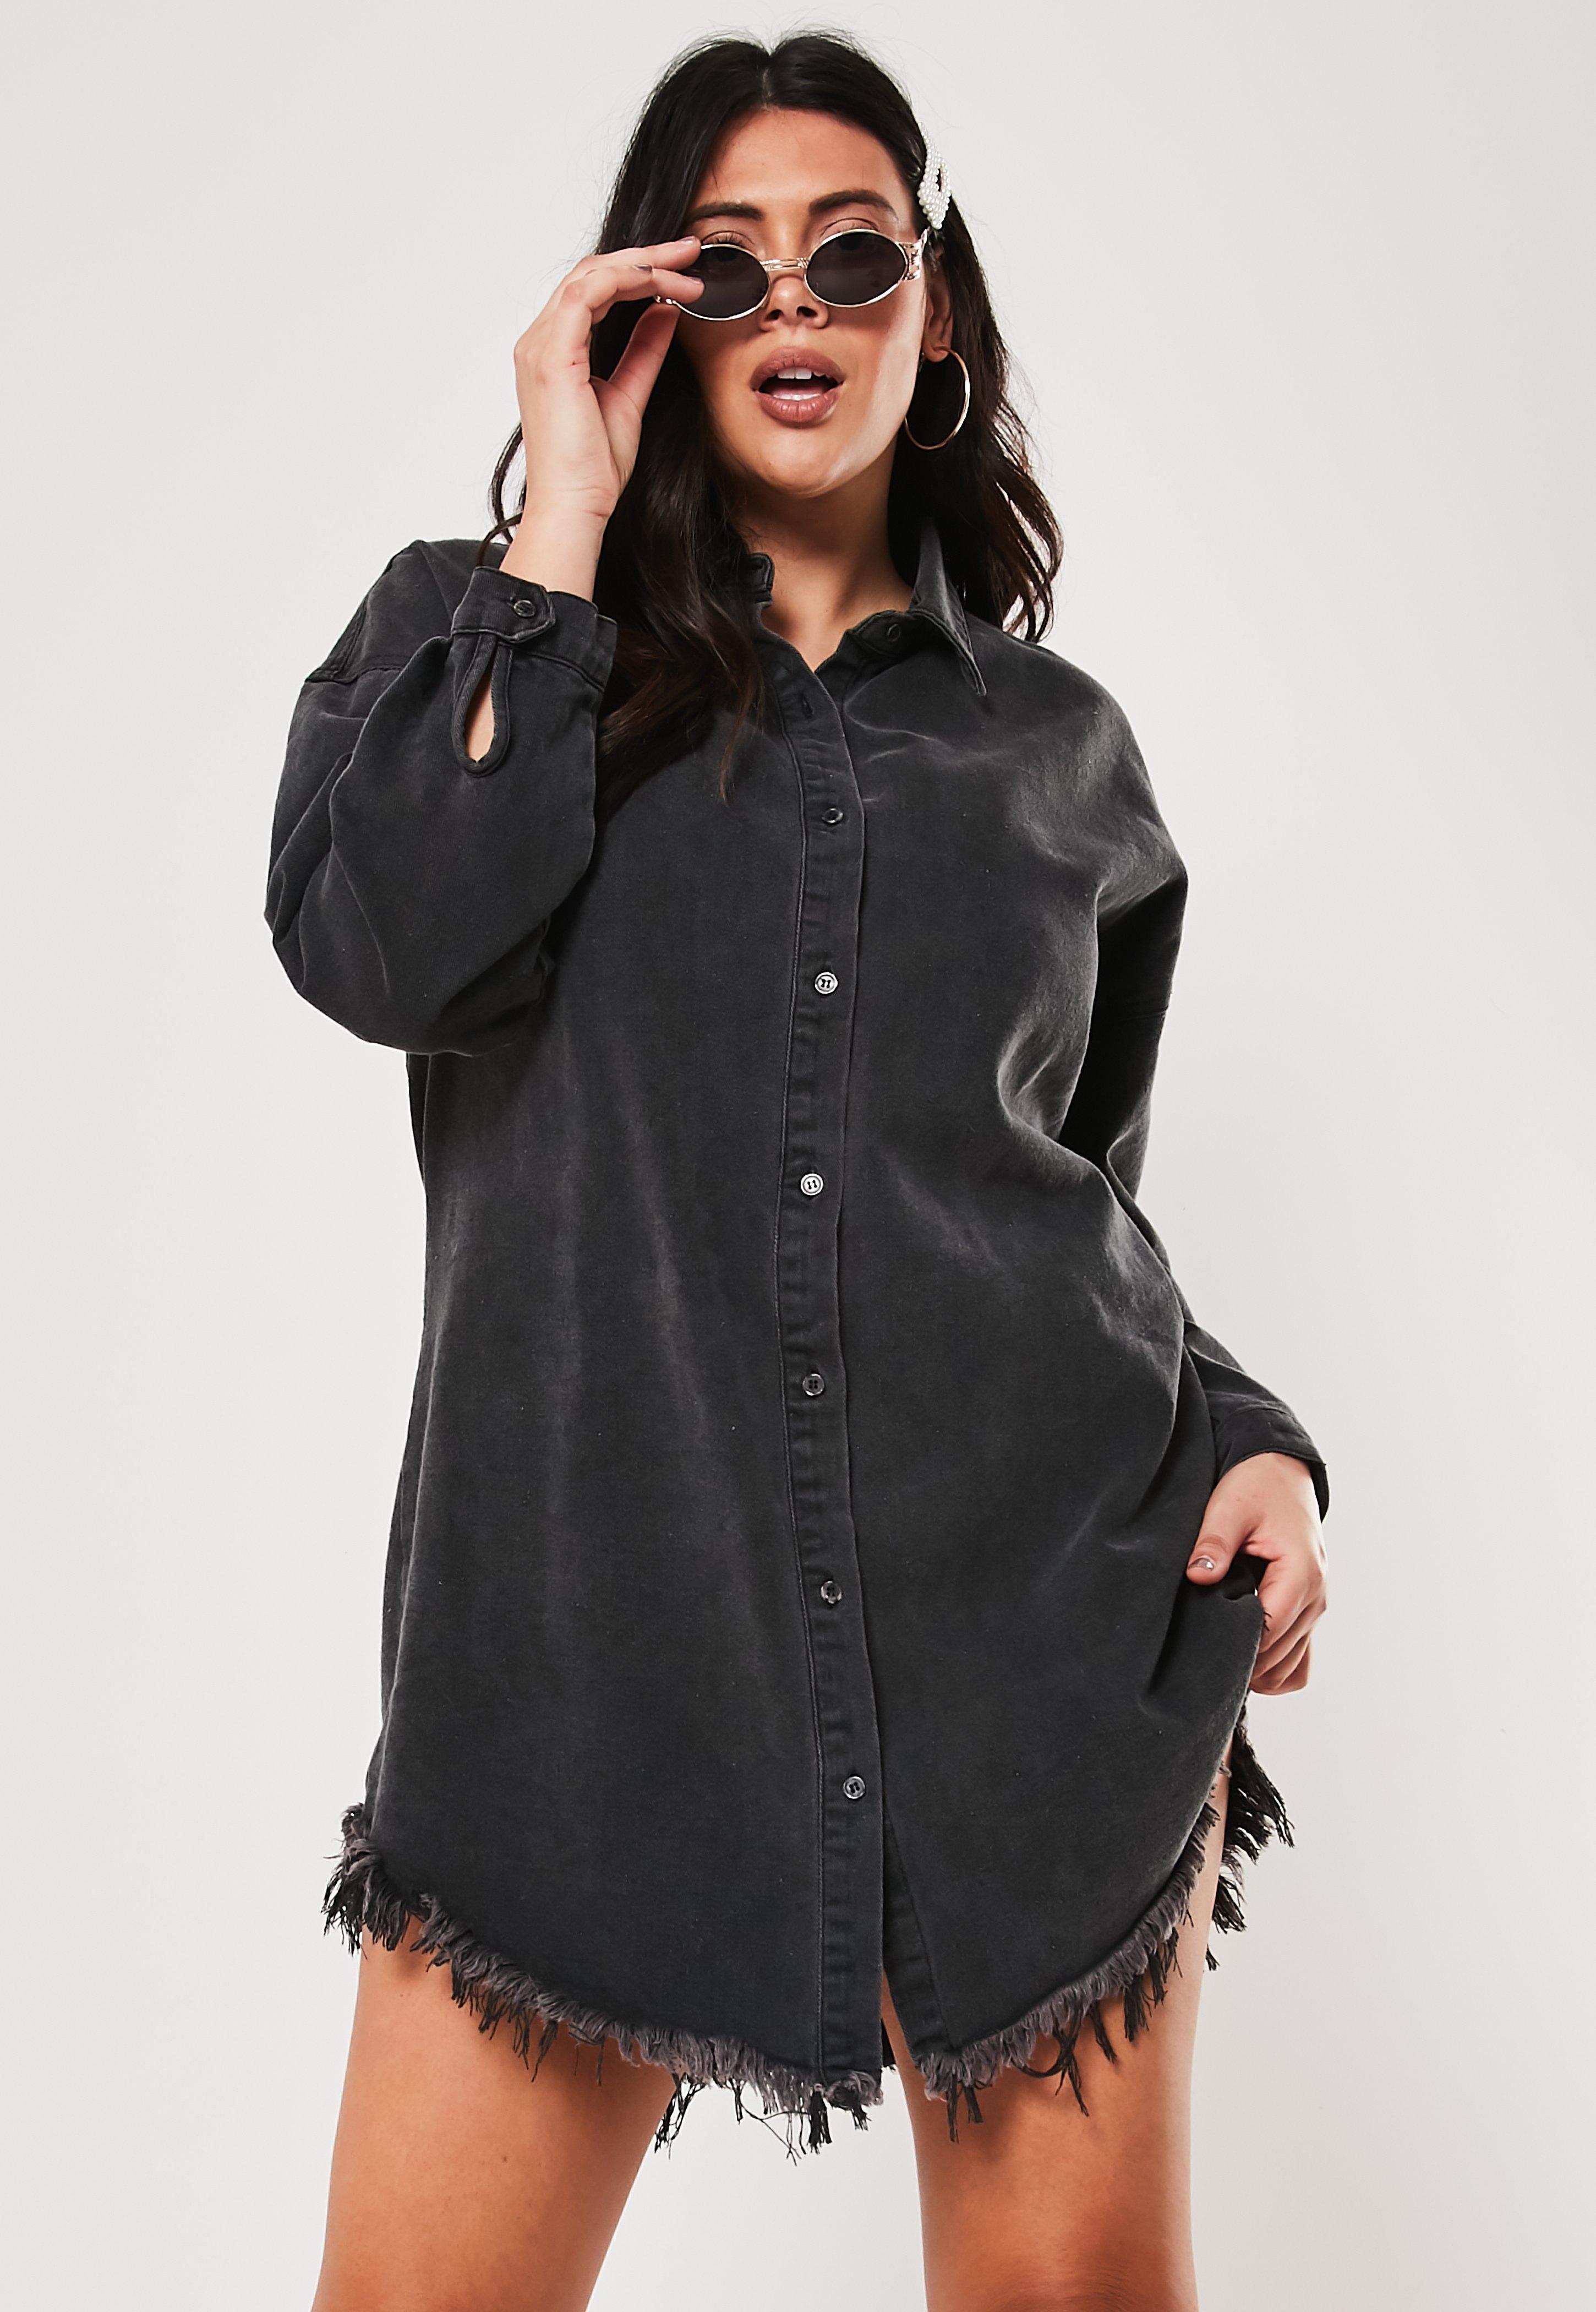 Tailles Robe Jeans Chemise Noire Grandes En DH2WIY9eE